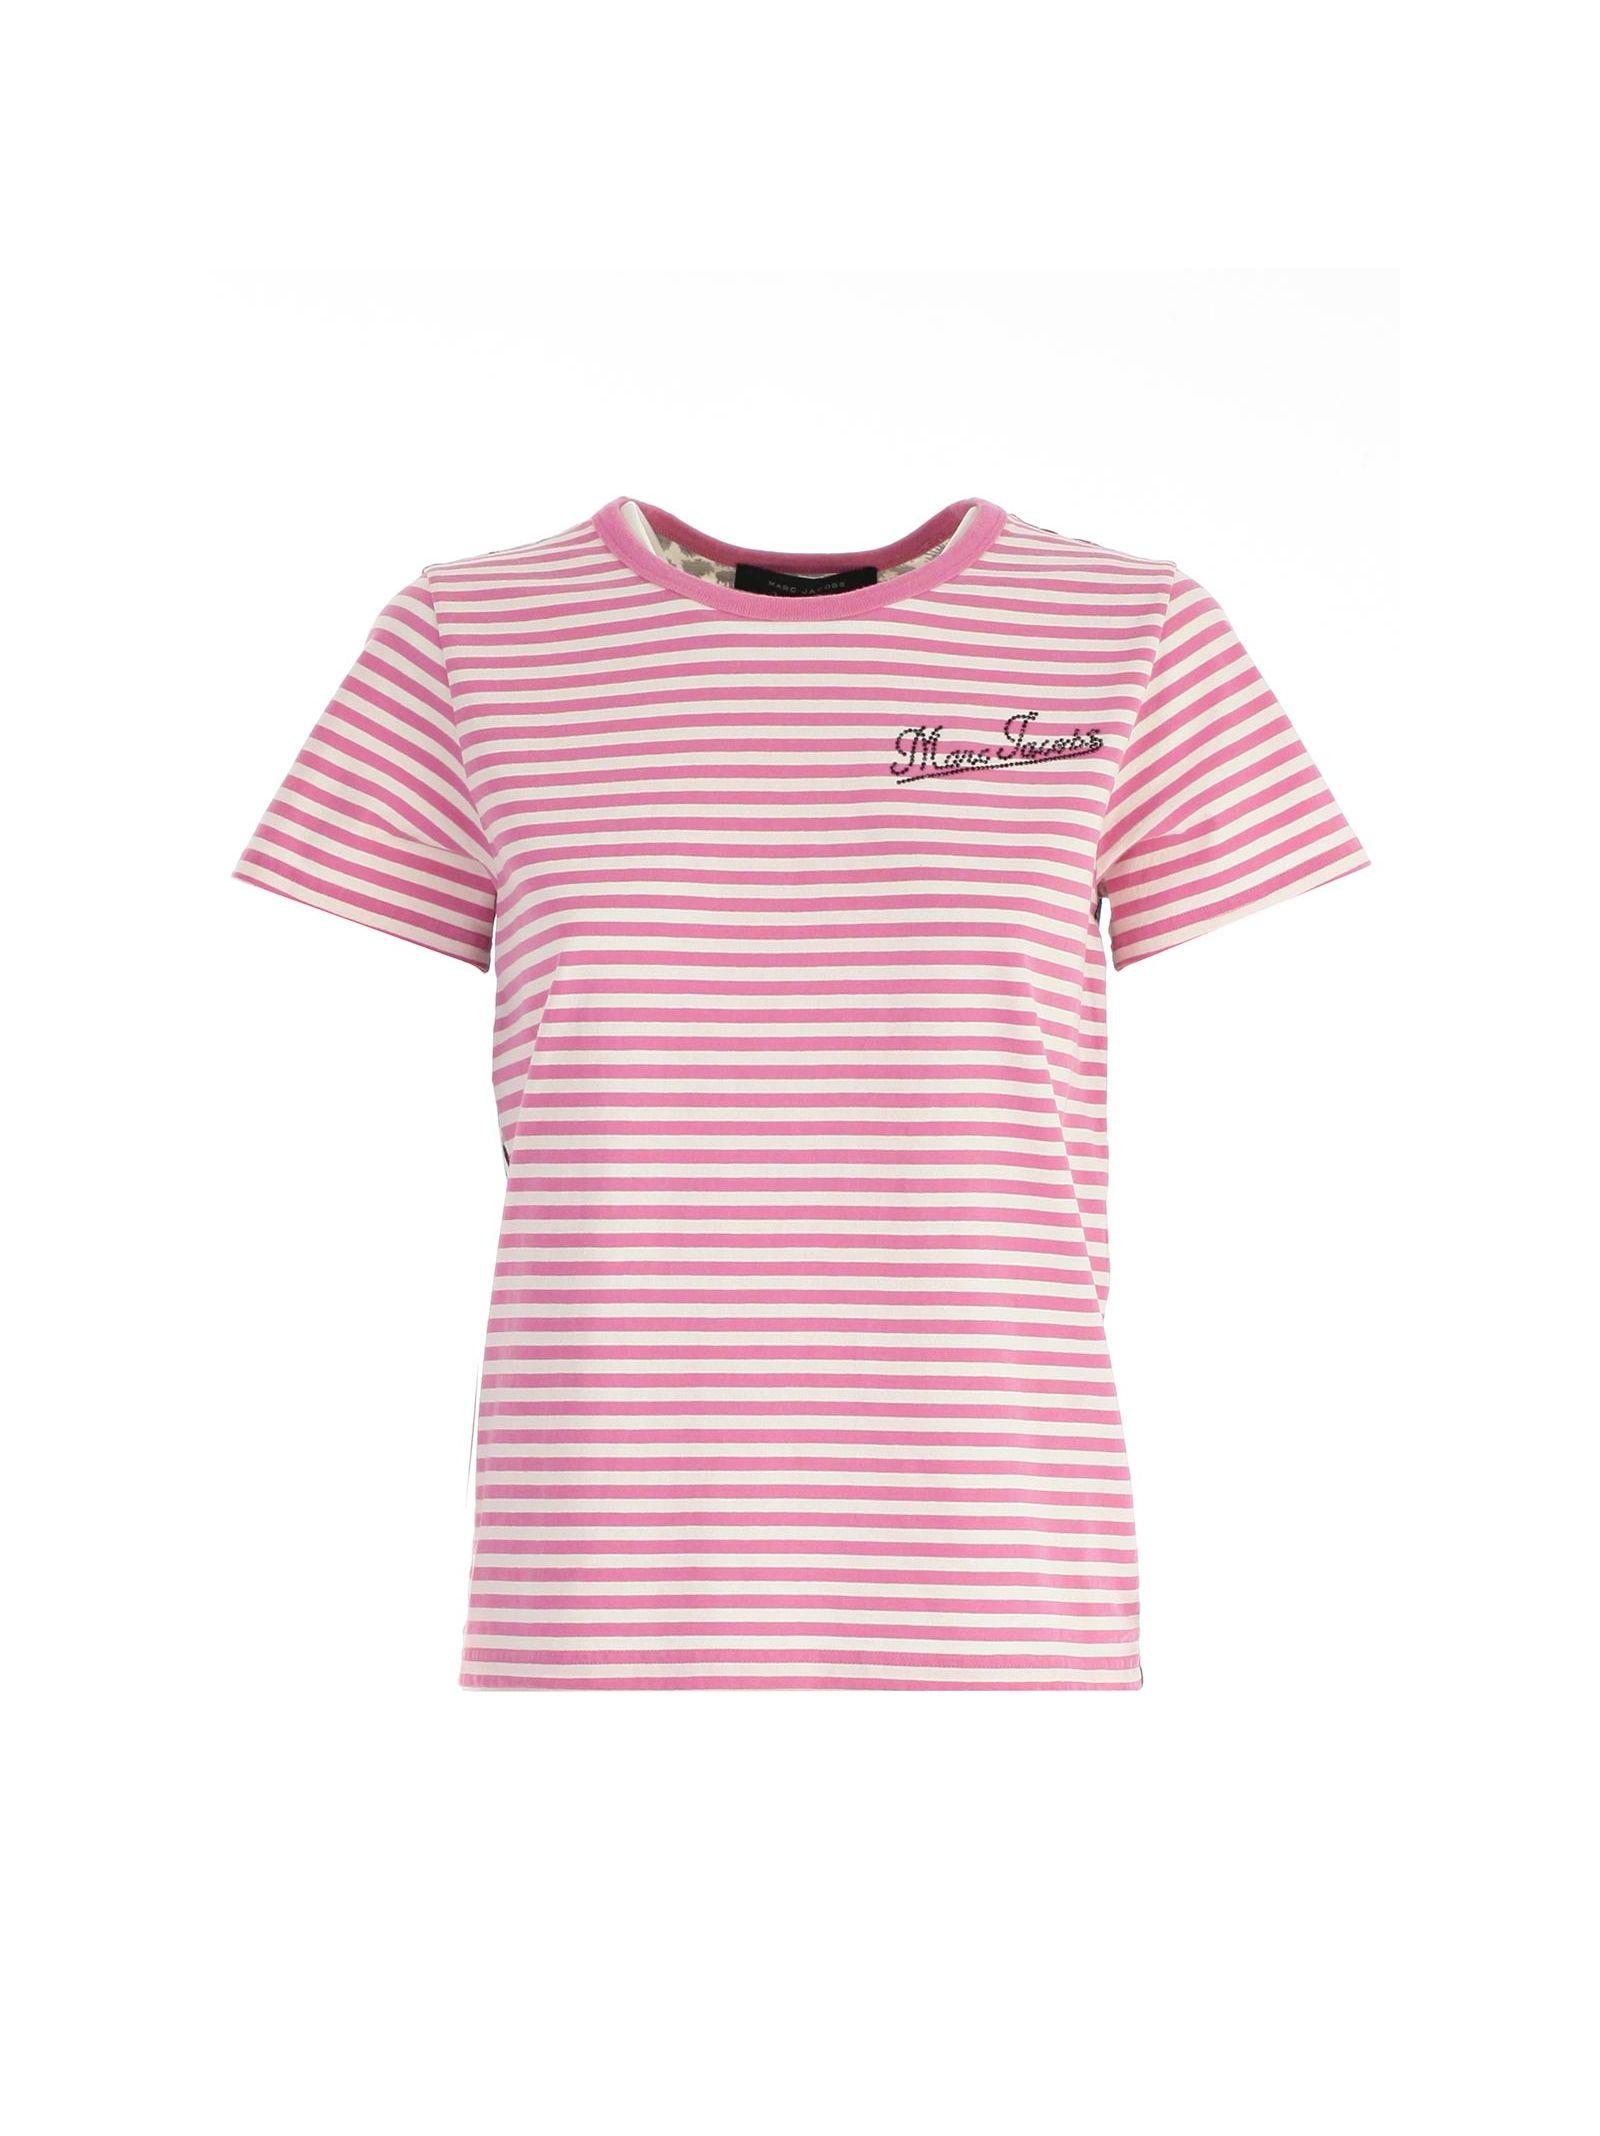 marc jacobs female marc jacobs short sleeve tshirt